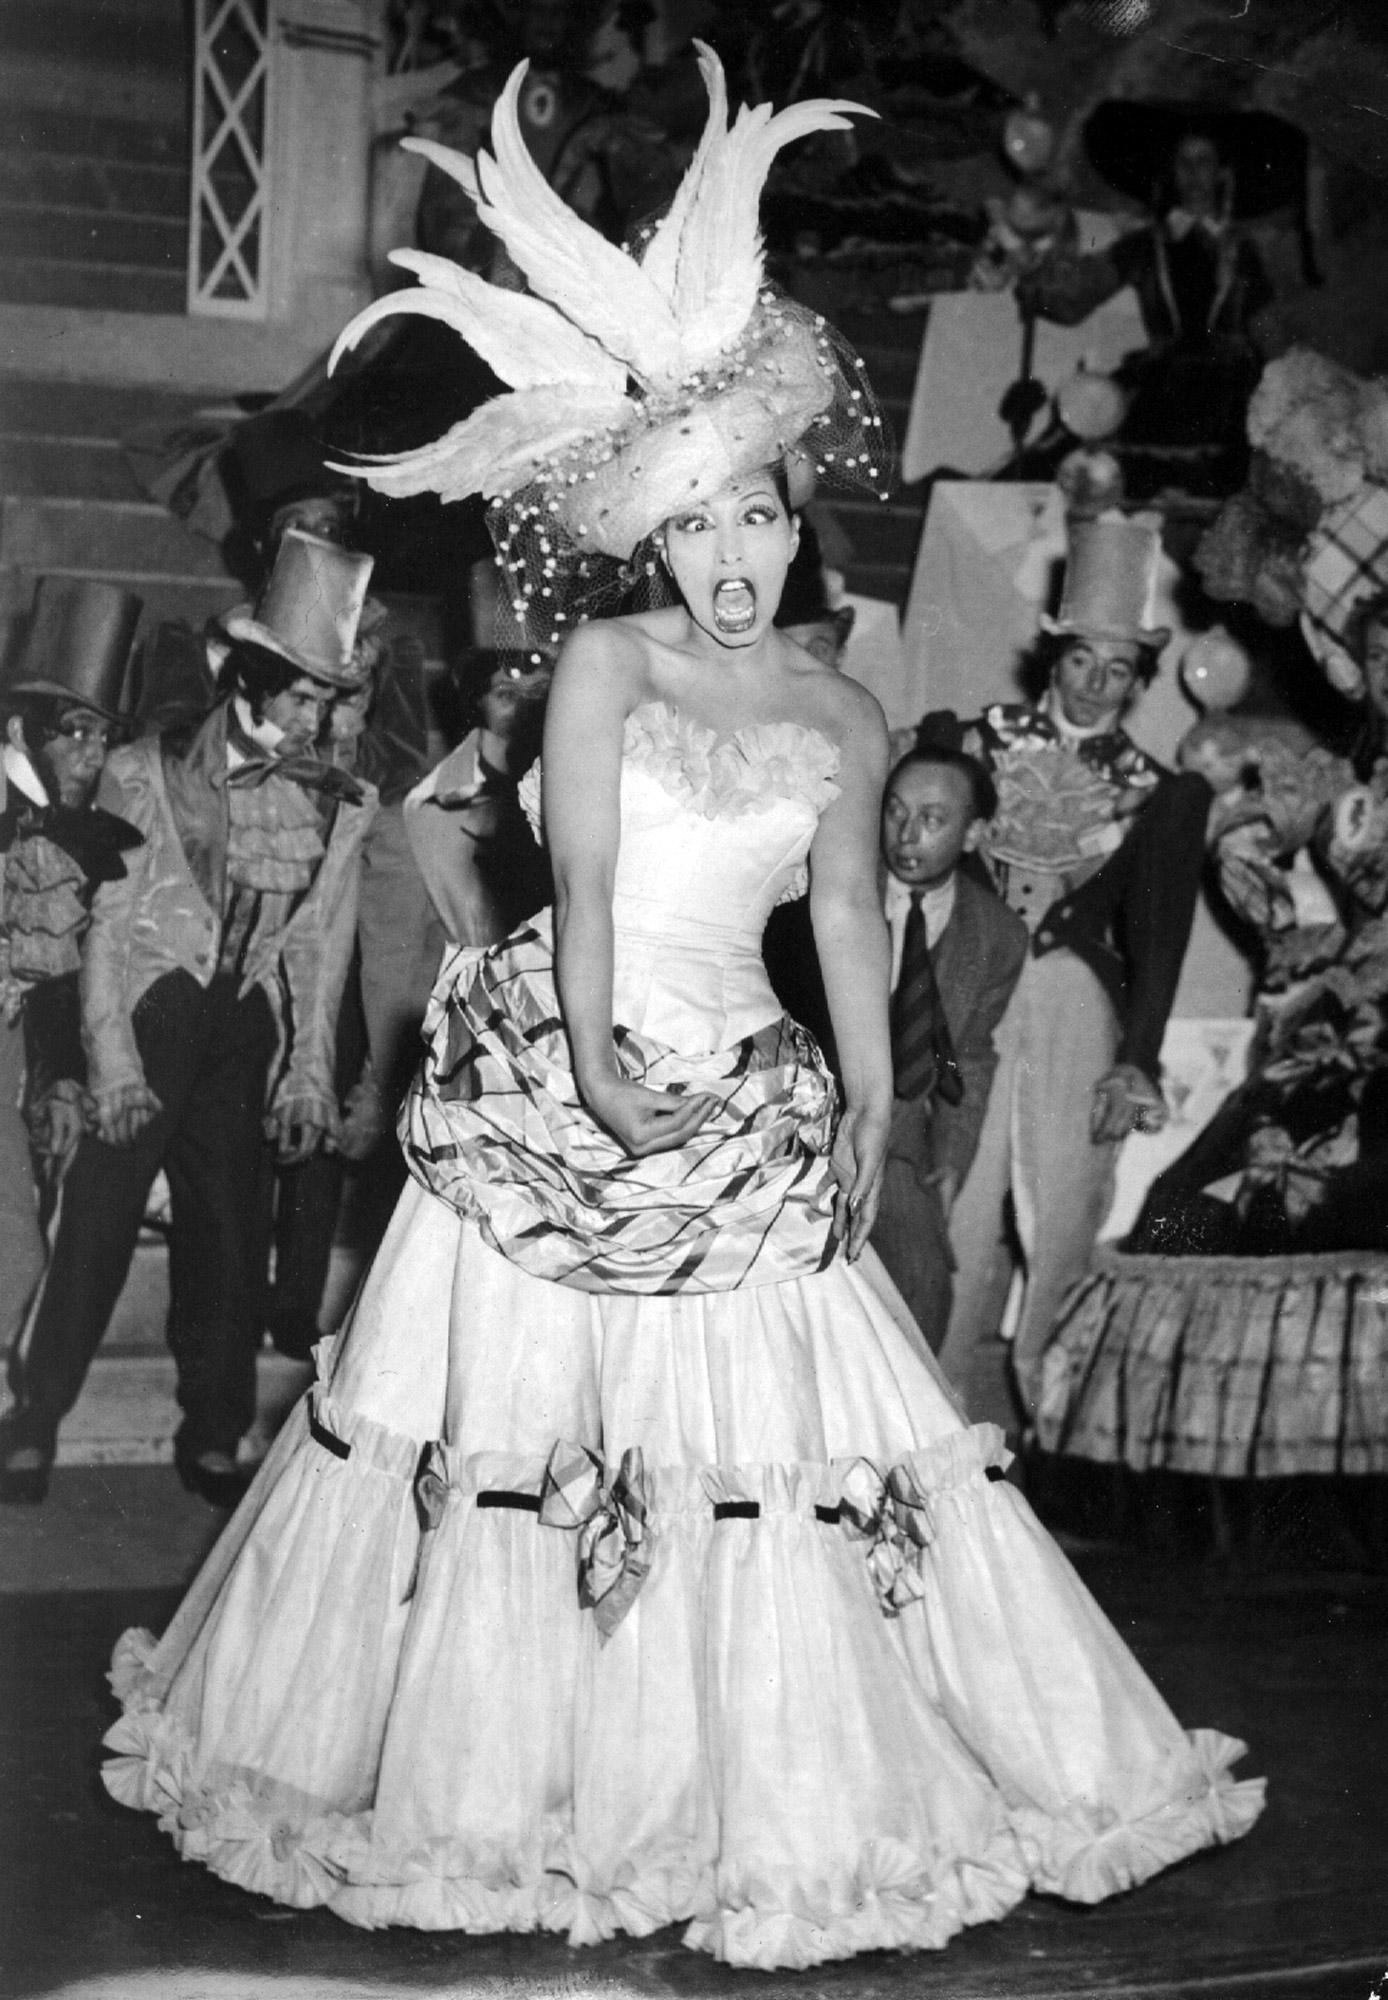 Josephine Baker during a show-revue at Paris, Feb. 21, 1949.